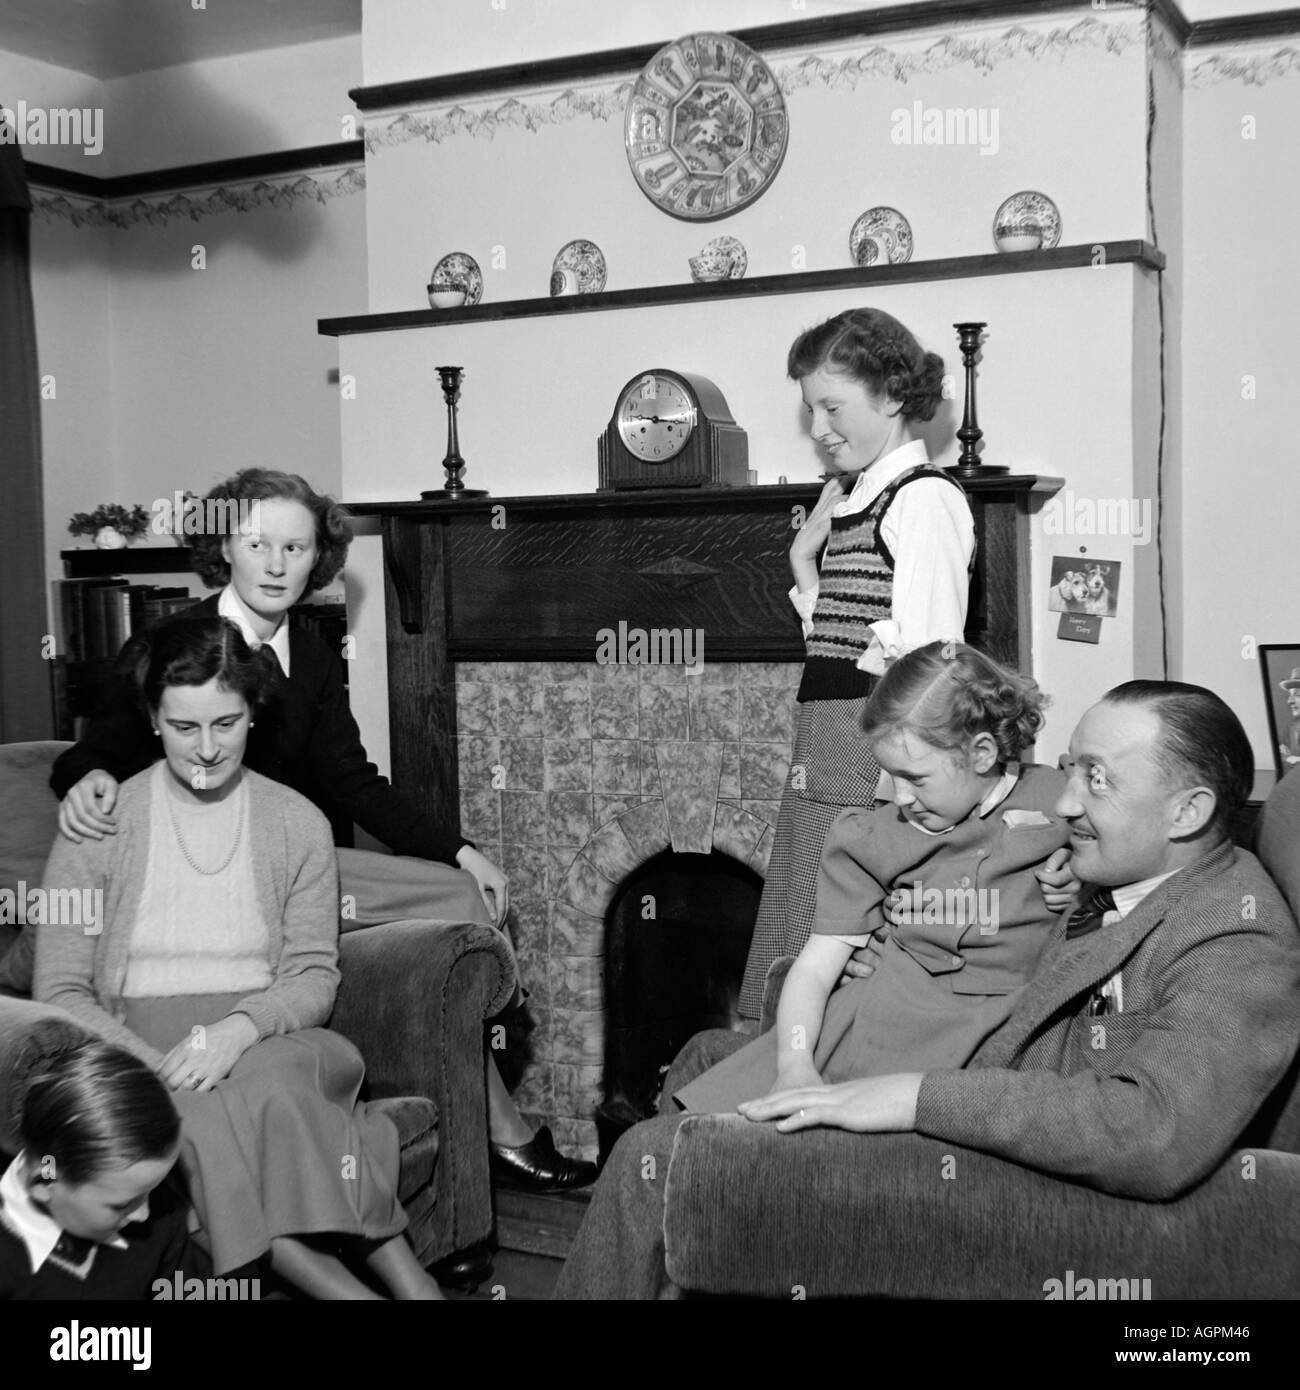 Alte Vintage Black And White Family Snapshot Foto Von Vater Mutter